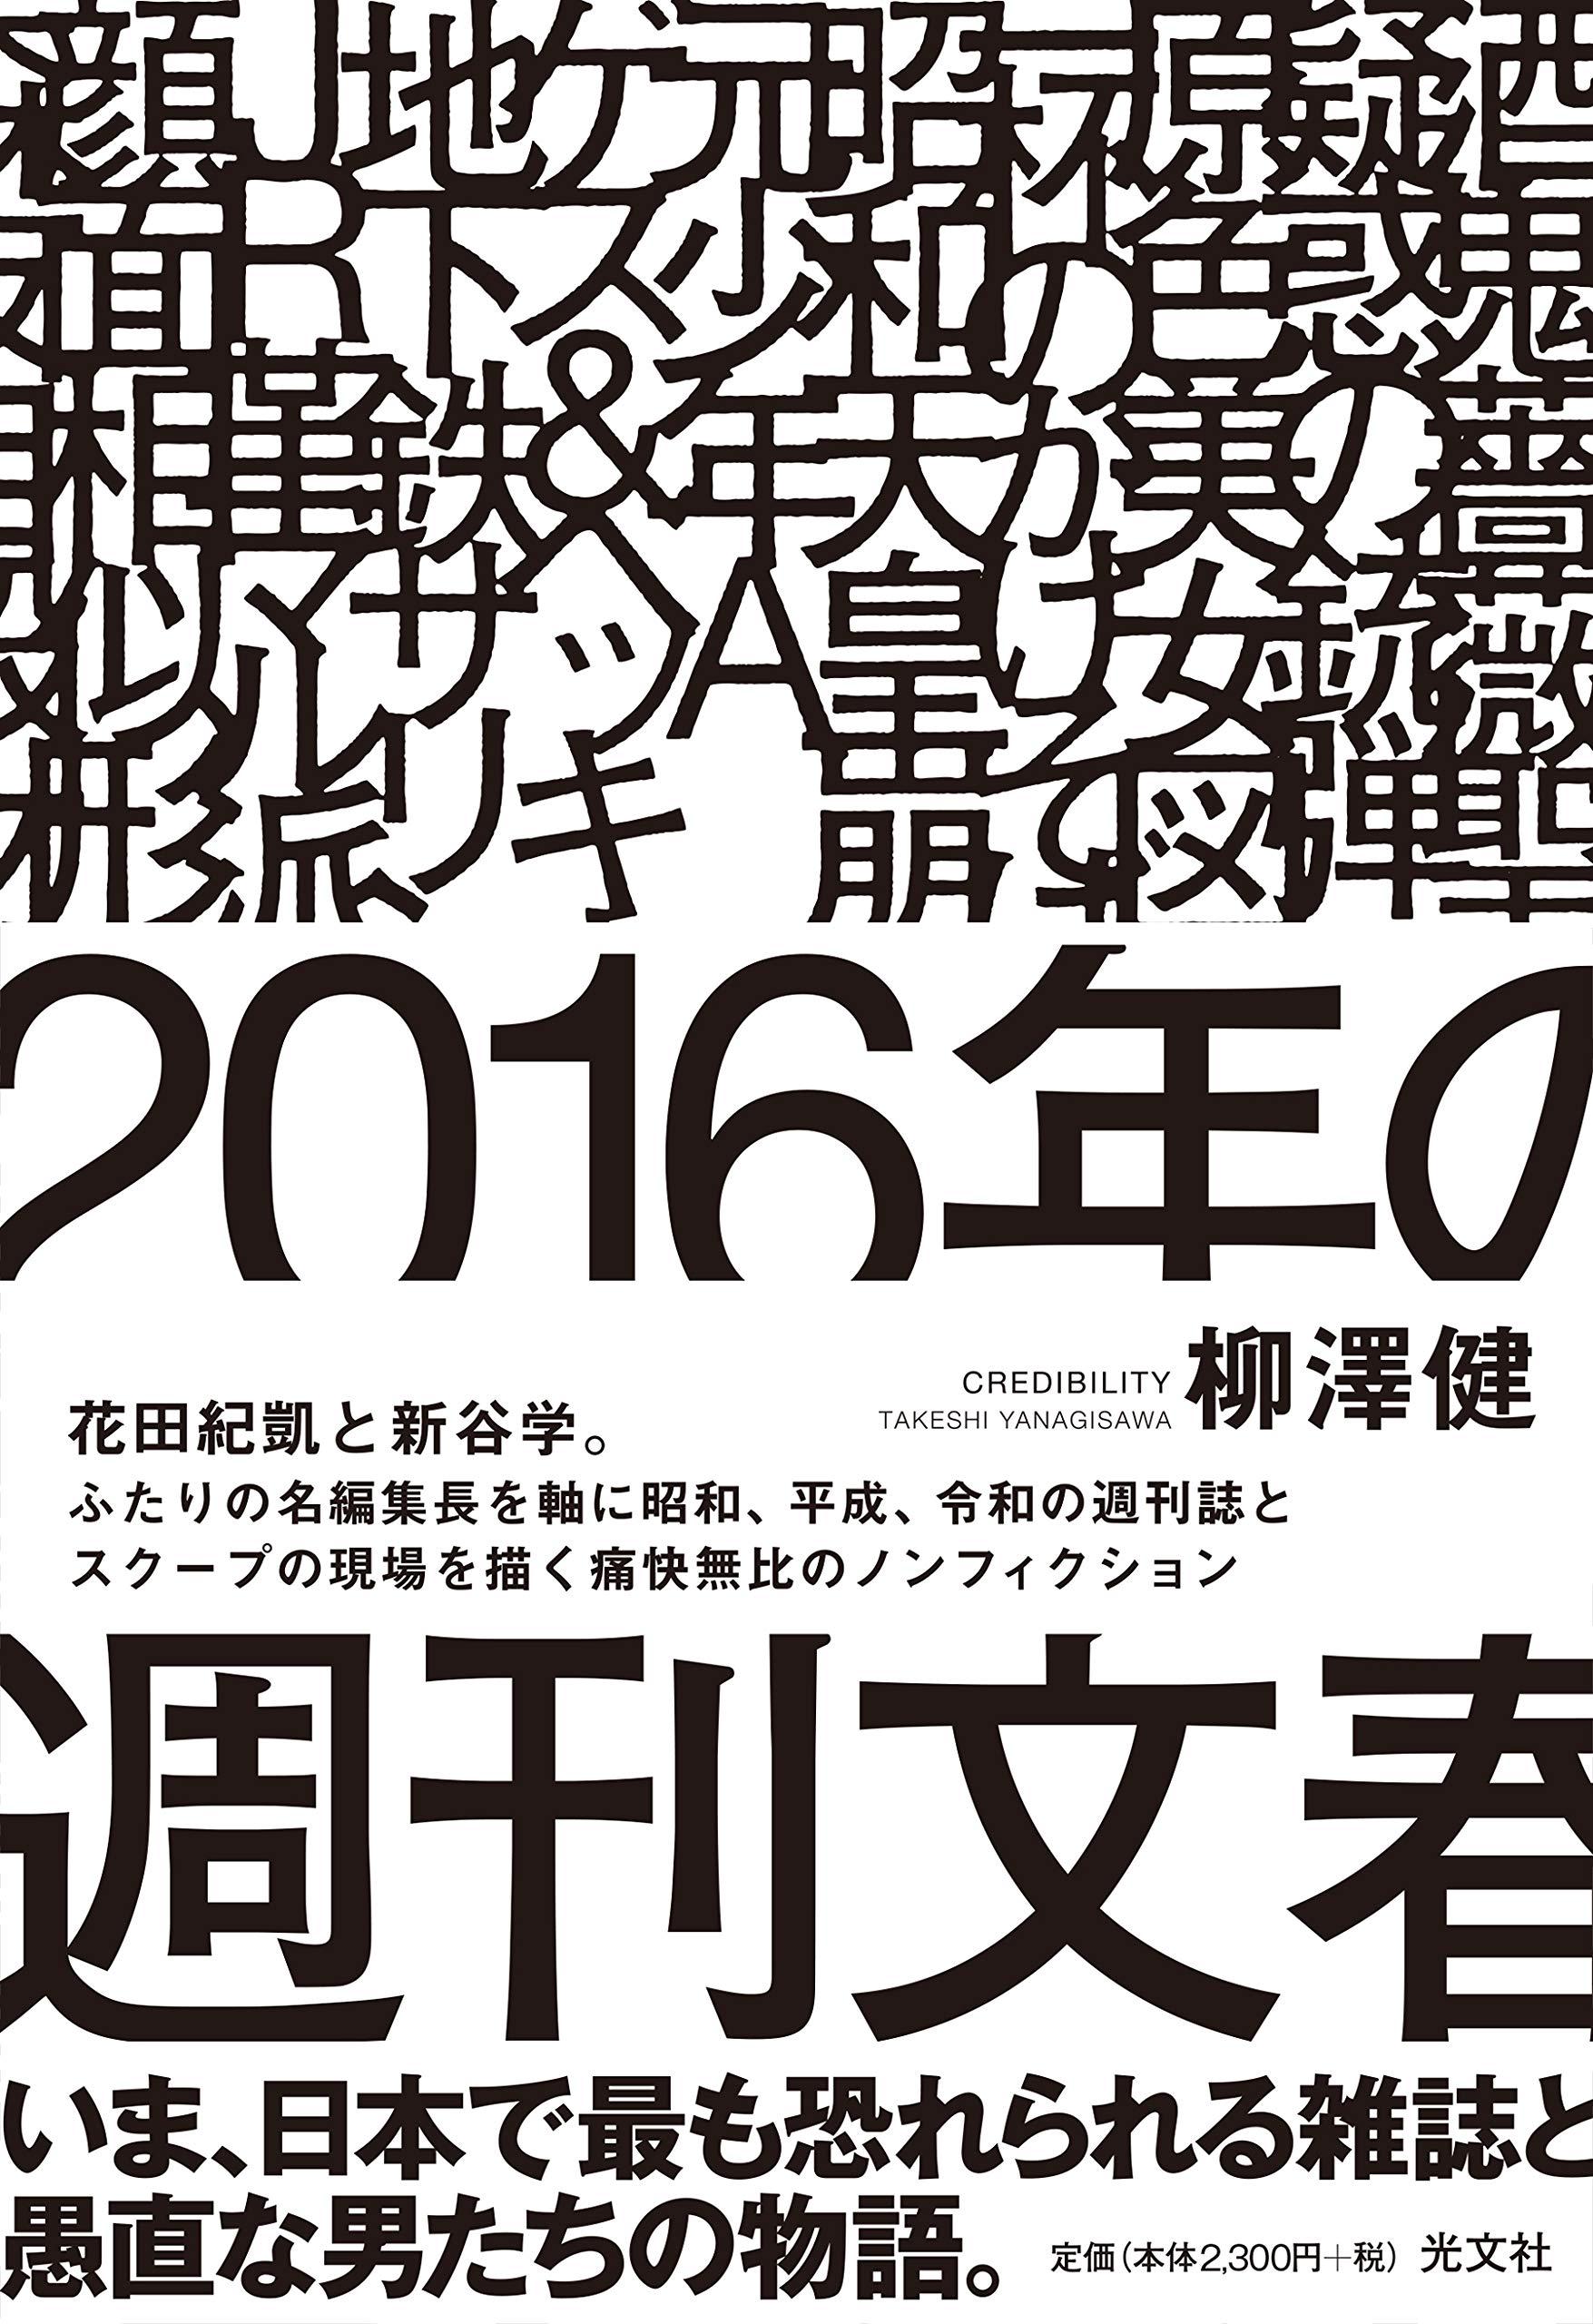 2016 年 は 平成 何 年